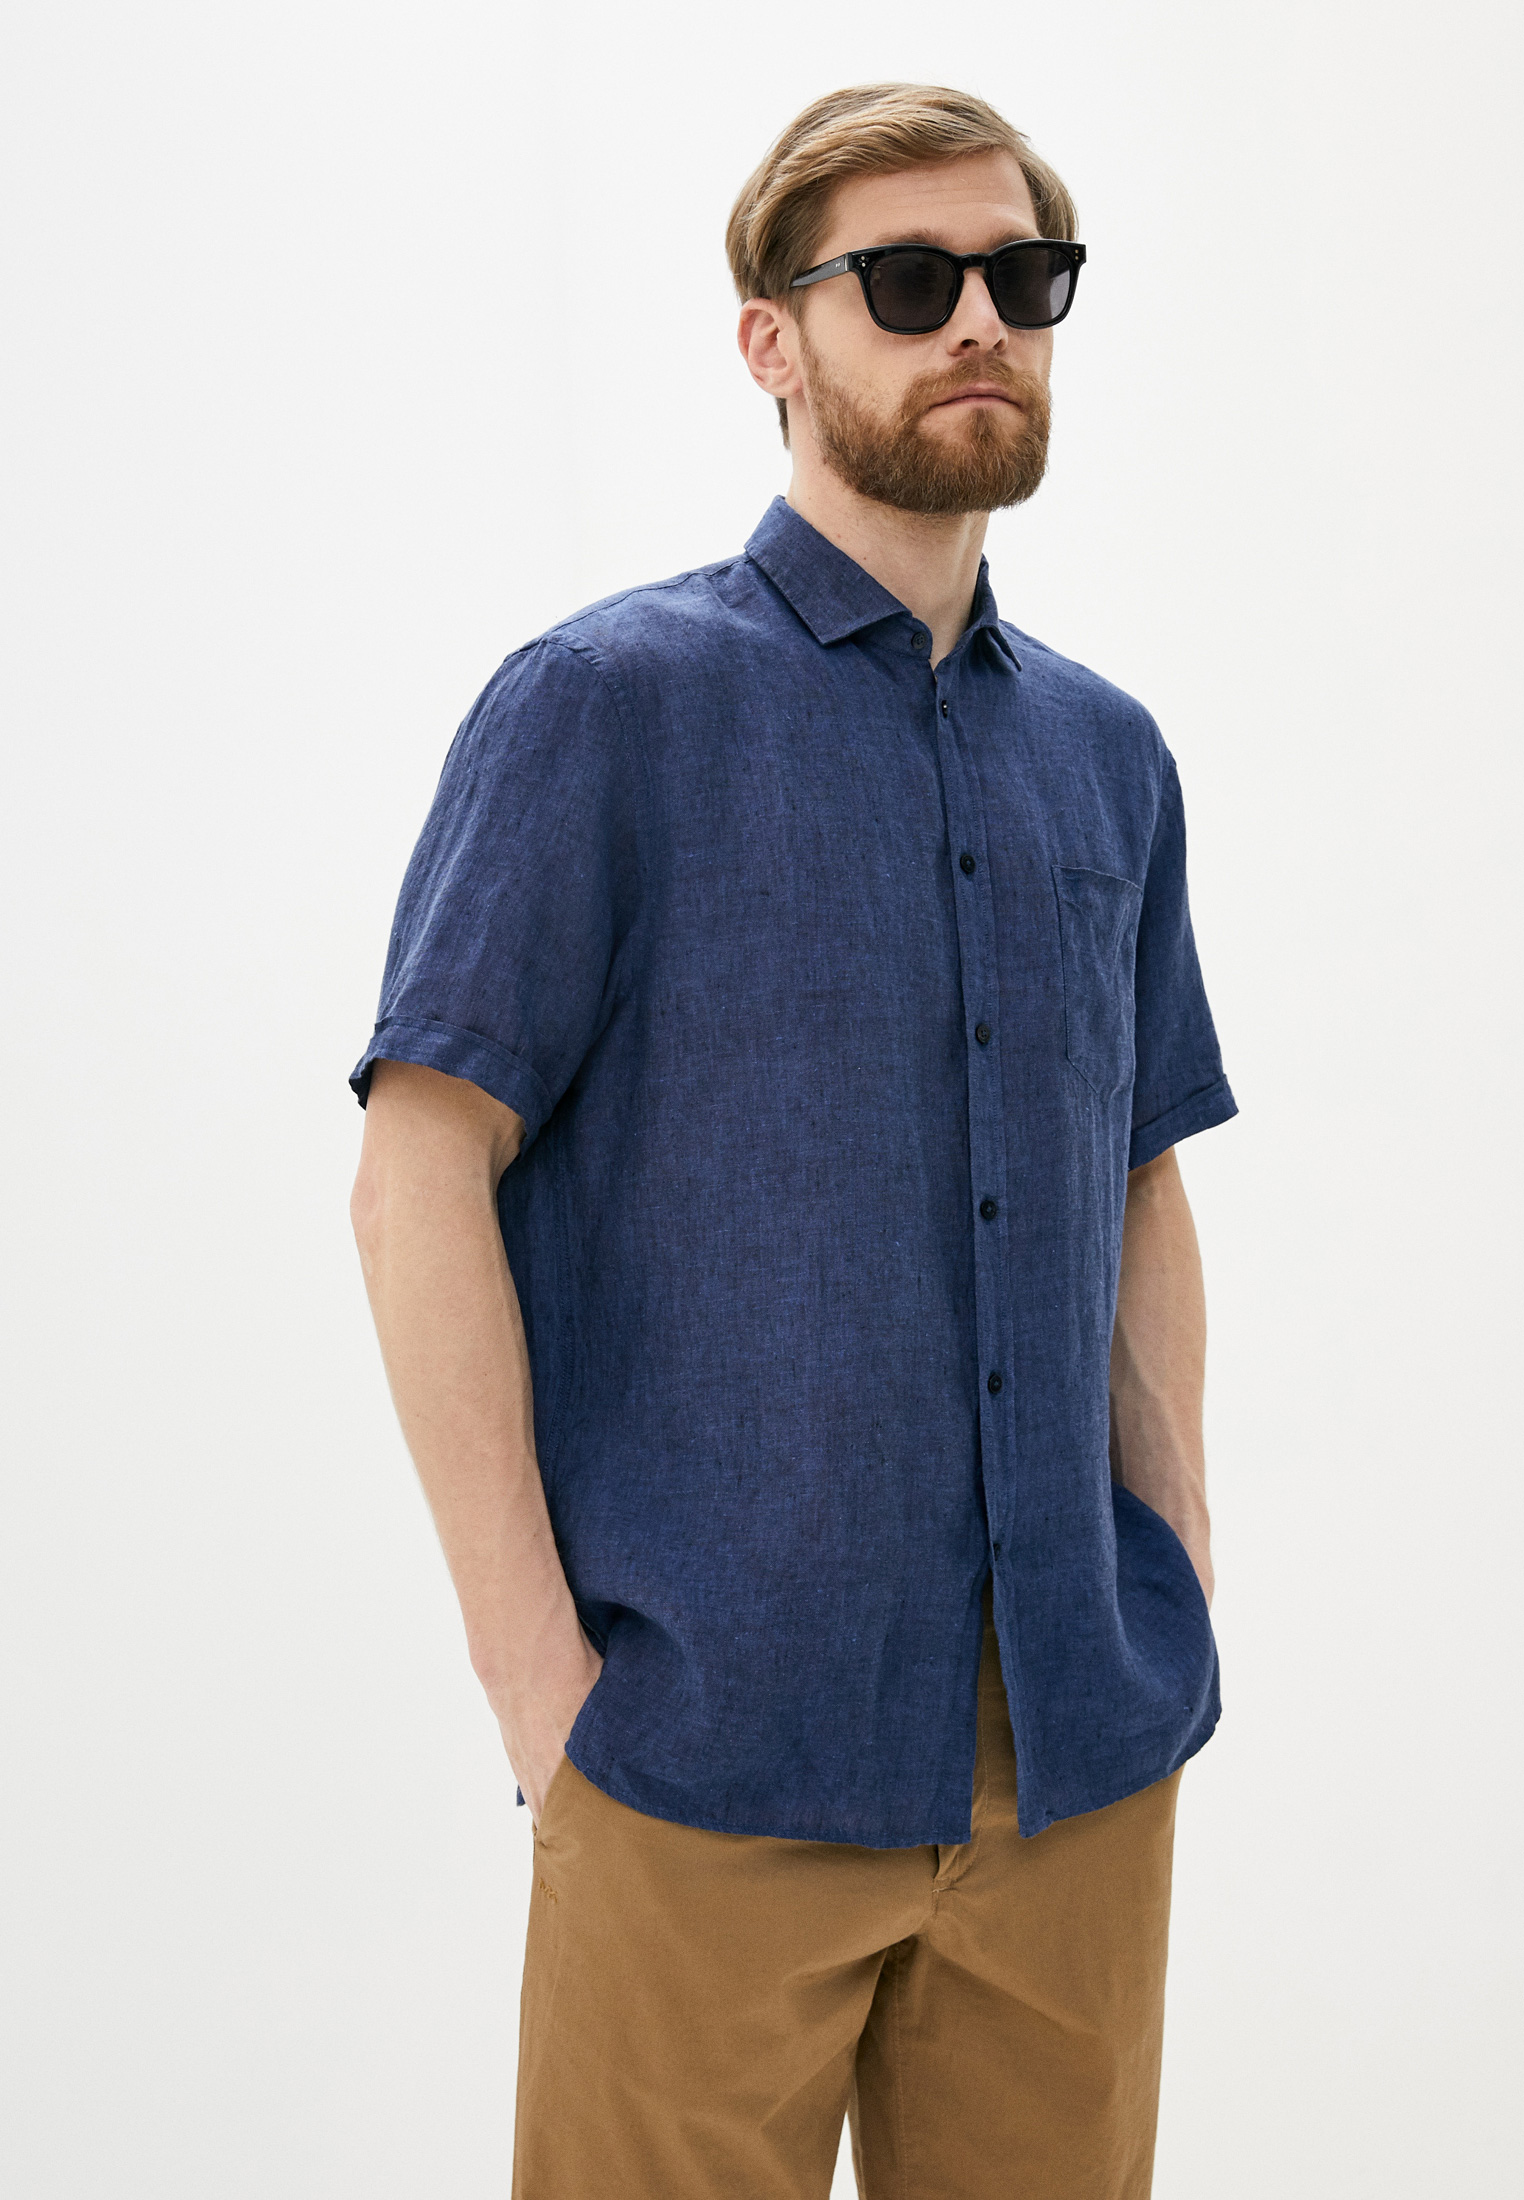 Рубашка с длинным рукавом Trussardi (Труссарди) 52c00140